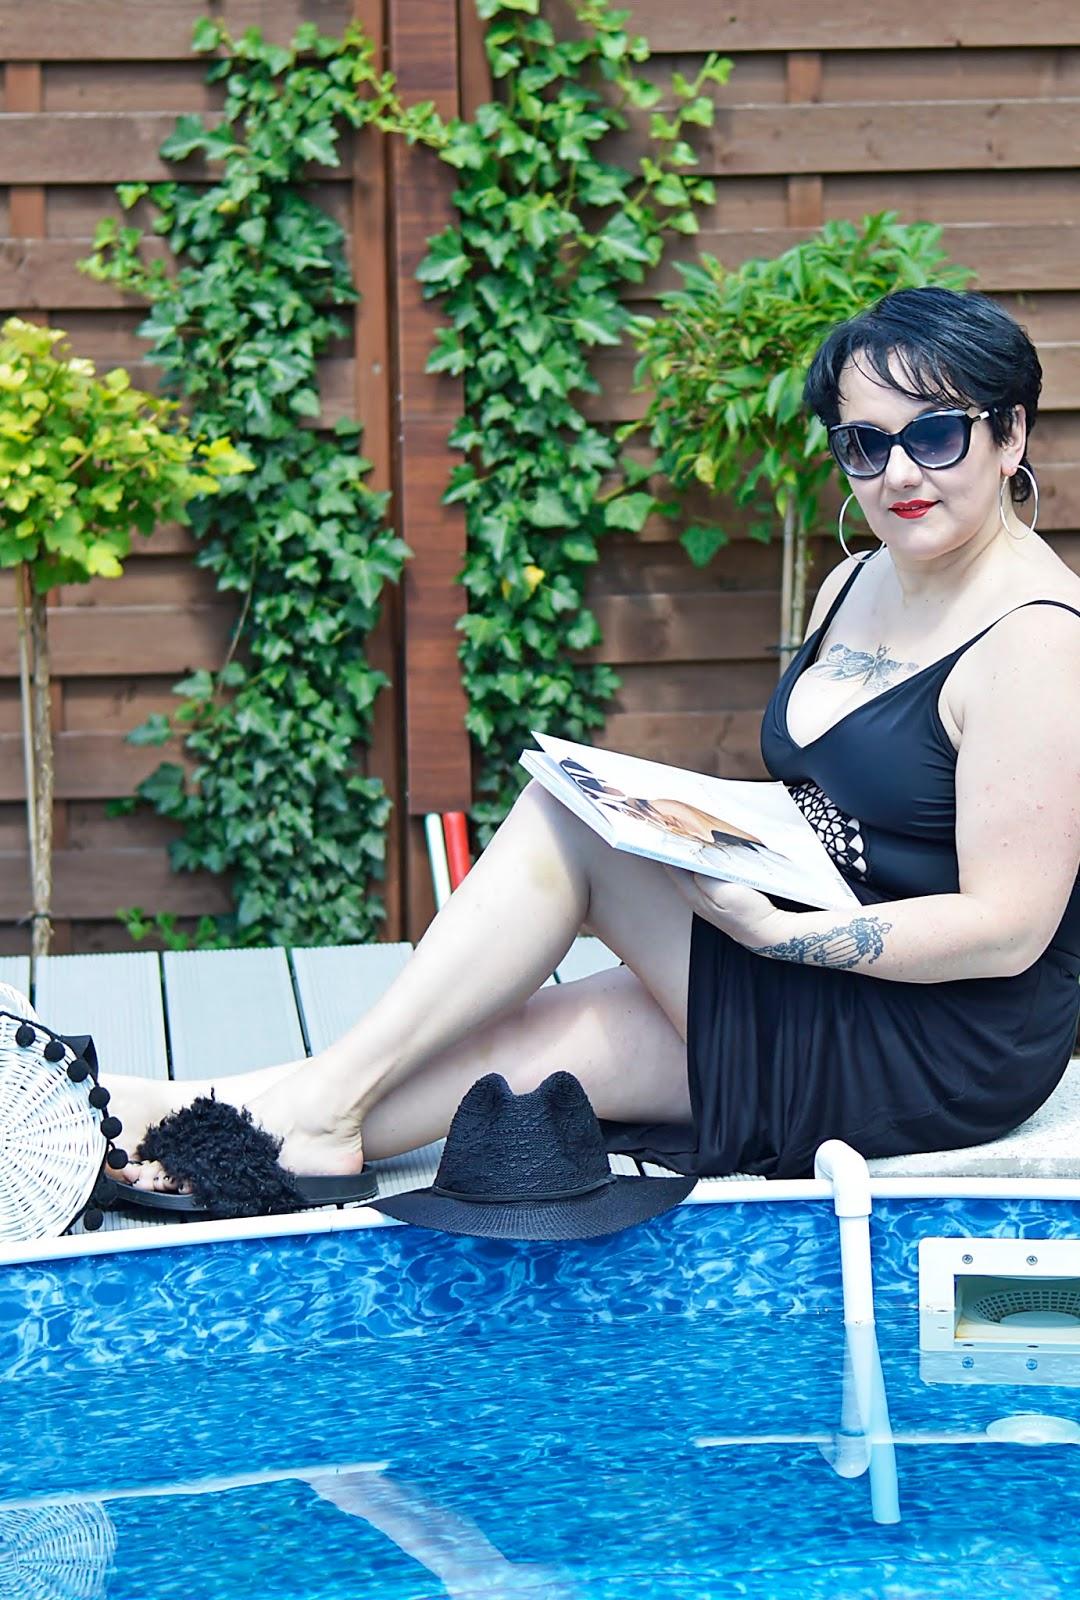 Hot summer, Strój kapielowy, Stylizacja na basen